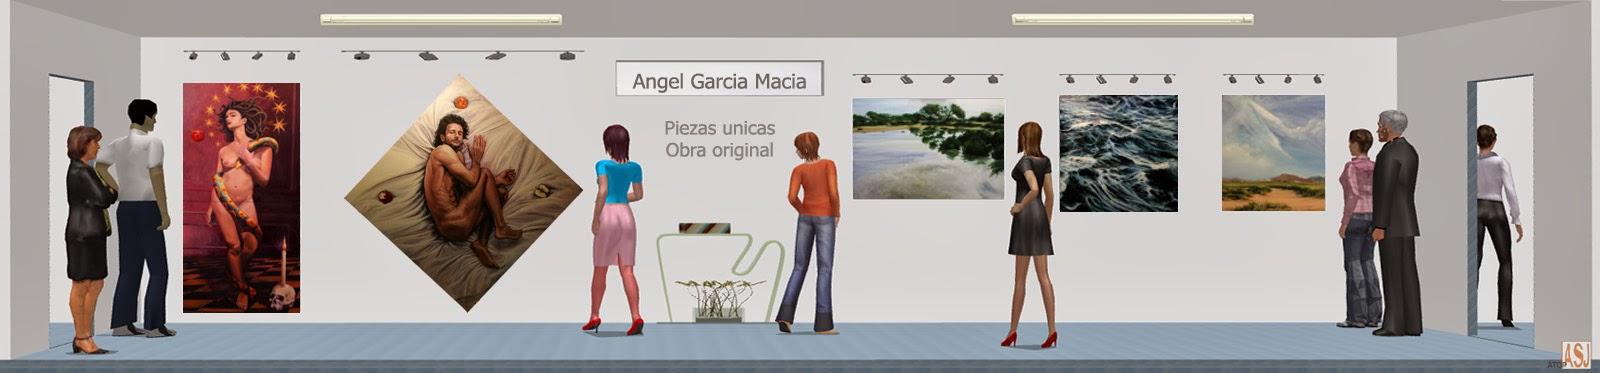 "<img src=""http://2.bp.blogspot.com/-YHDJnkq5N5U/Ut6bR9I3FpI/AAAAAAAAT-k/Ddf73G-KOjw/s1600/sala-de-exposicion-de-angel-garcia-macia.jpg"" alt="" sala de exposicion virtual de pinturas de Ángel García Maciá ""/>"